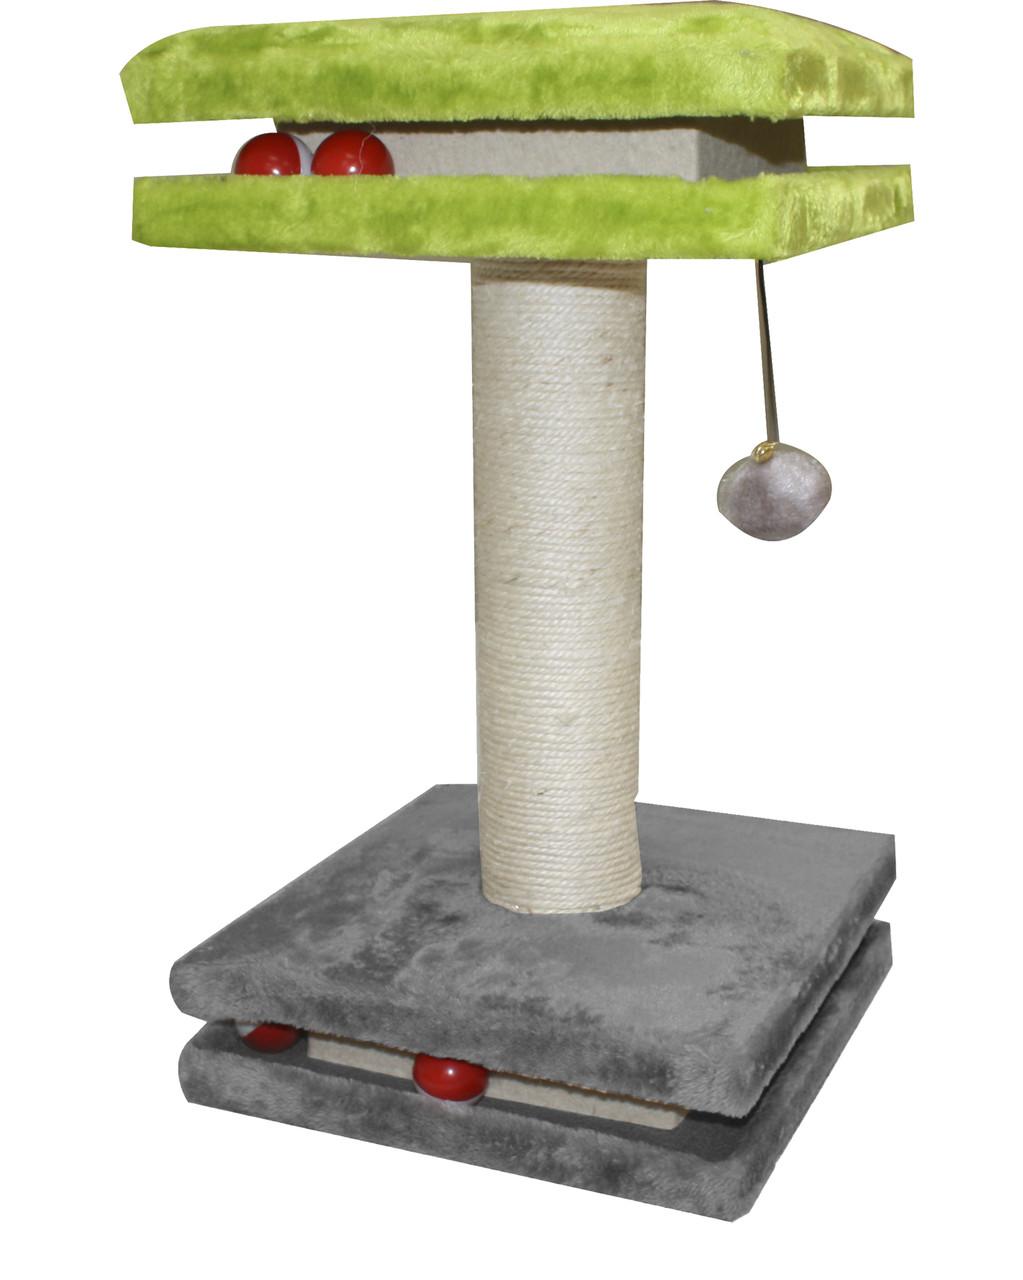 Когтеточка CROCI Interactive Floors, этажерка с шариками, плюш/сезаль, 35х35х50см